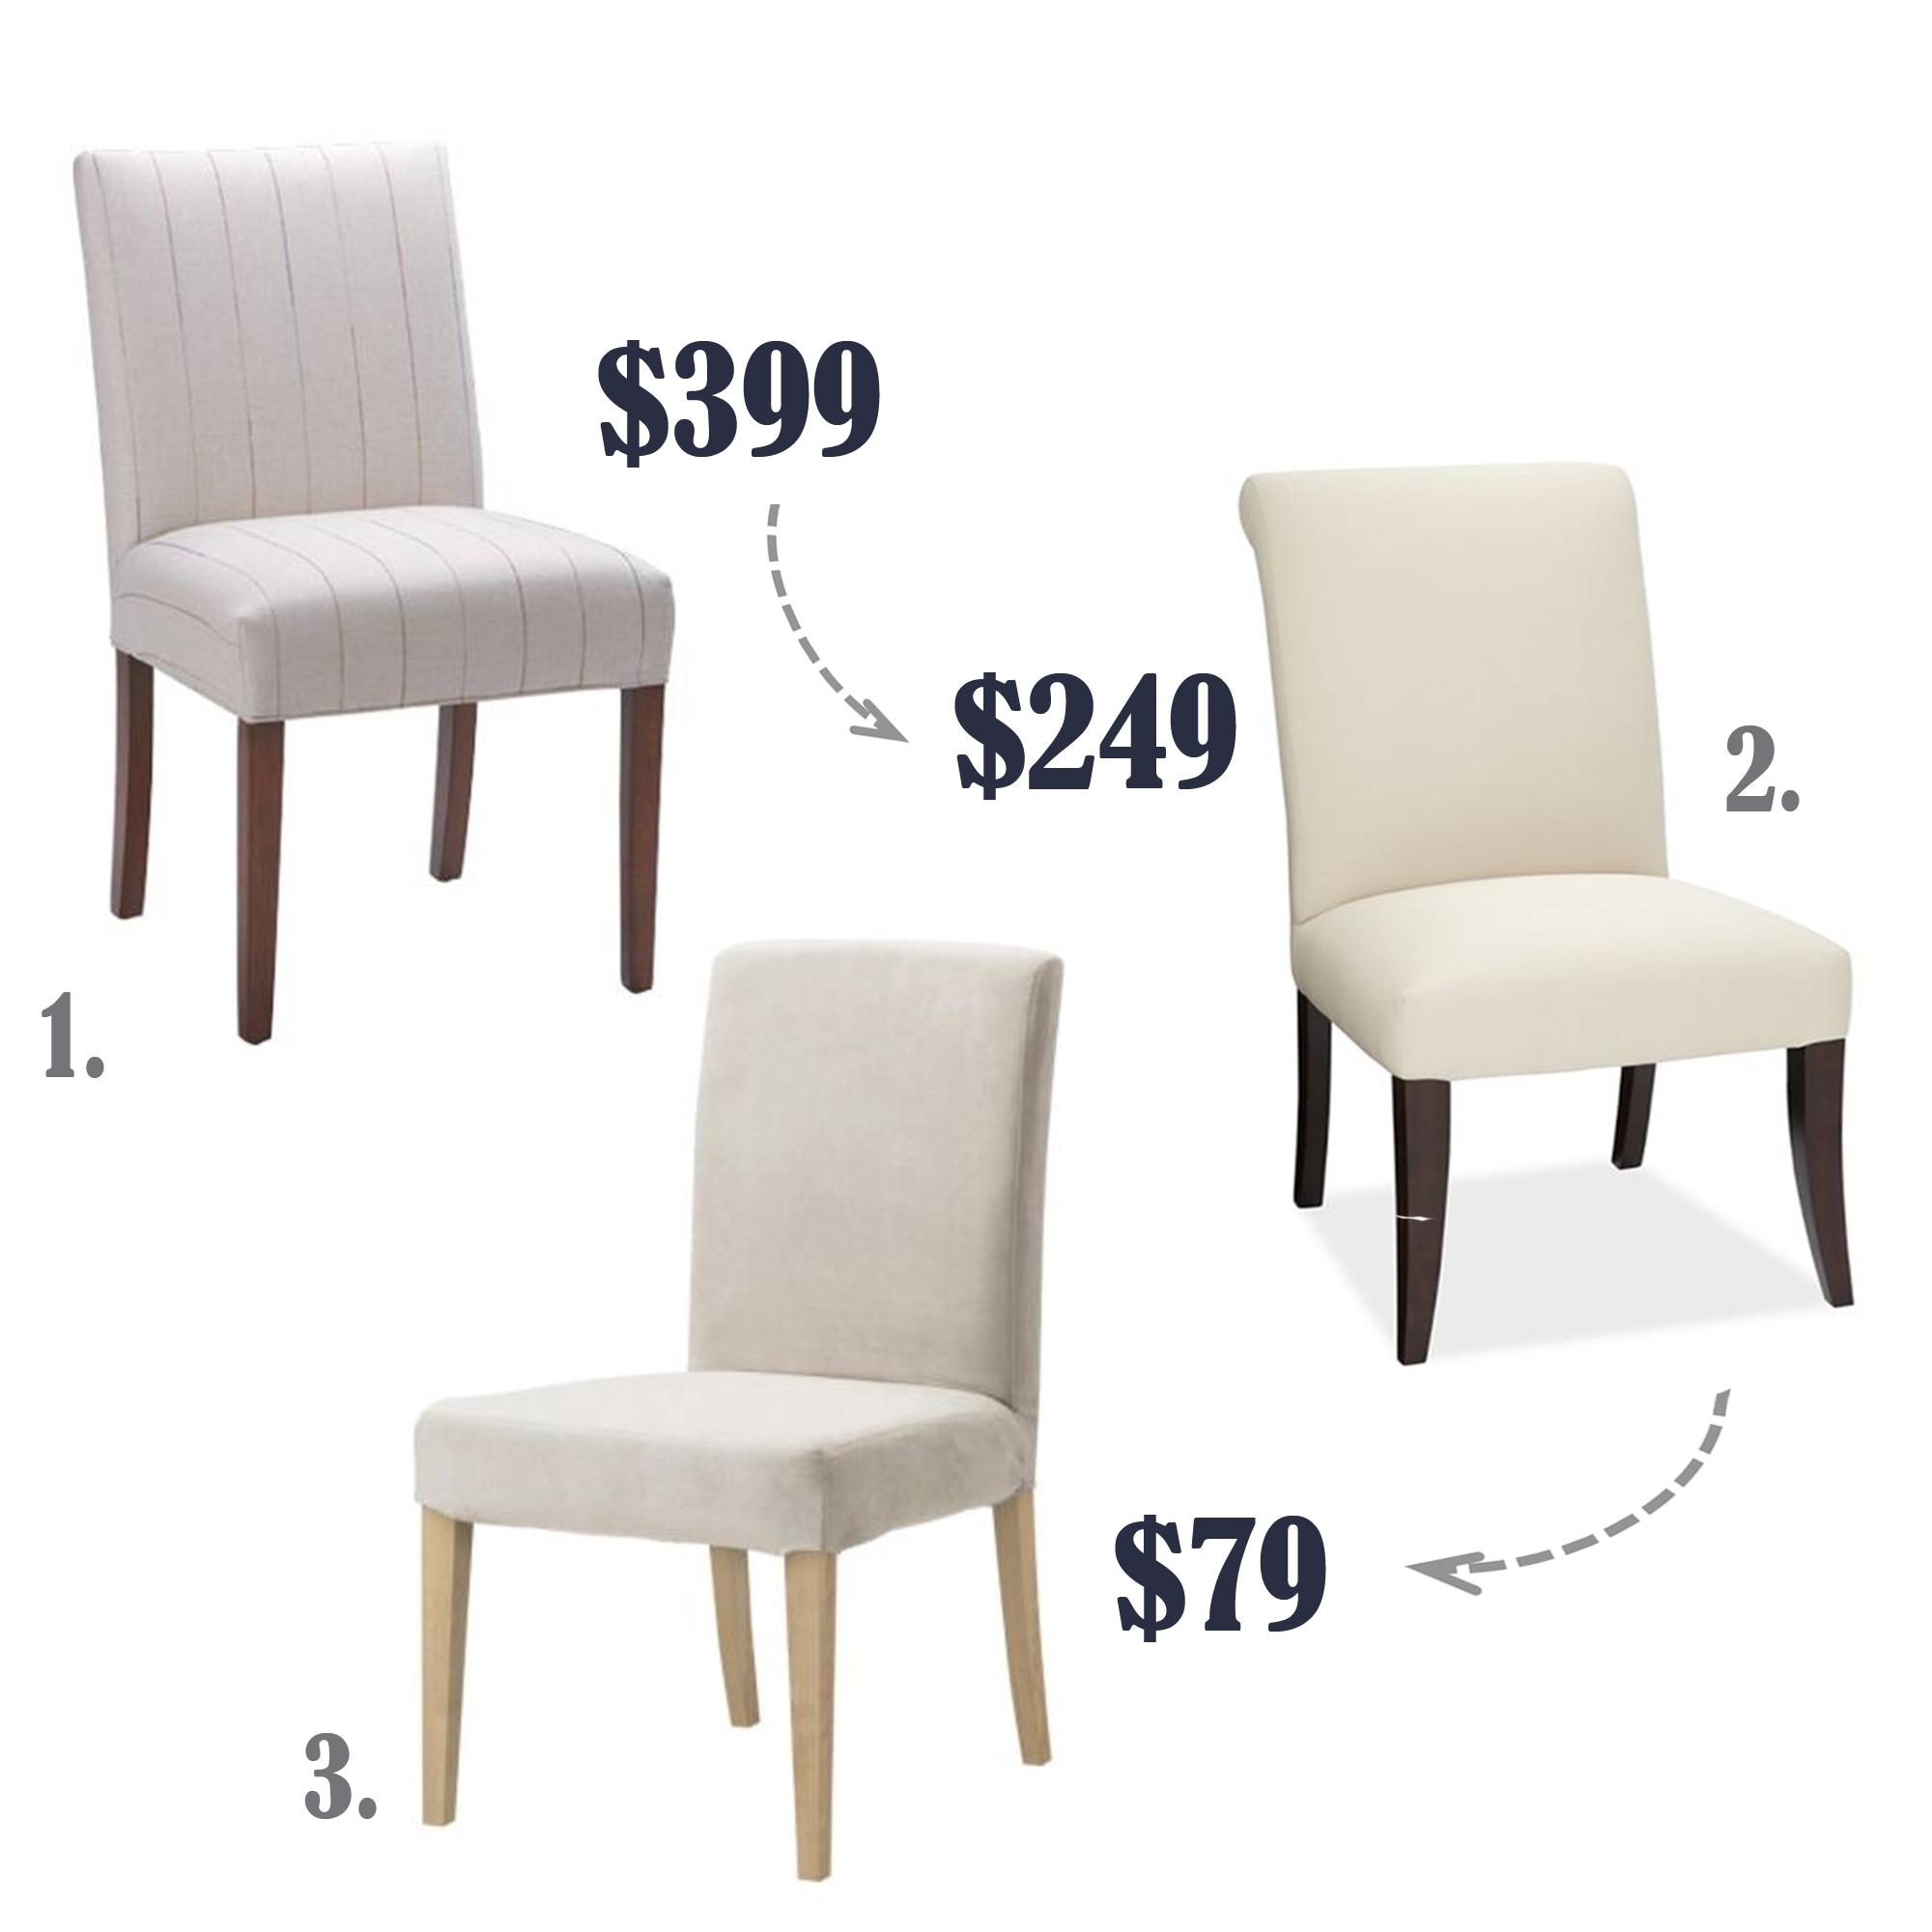 Ikea dining room 2013 - Chairs